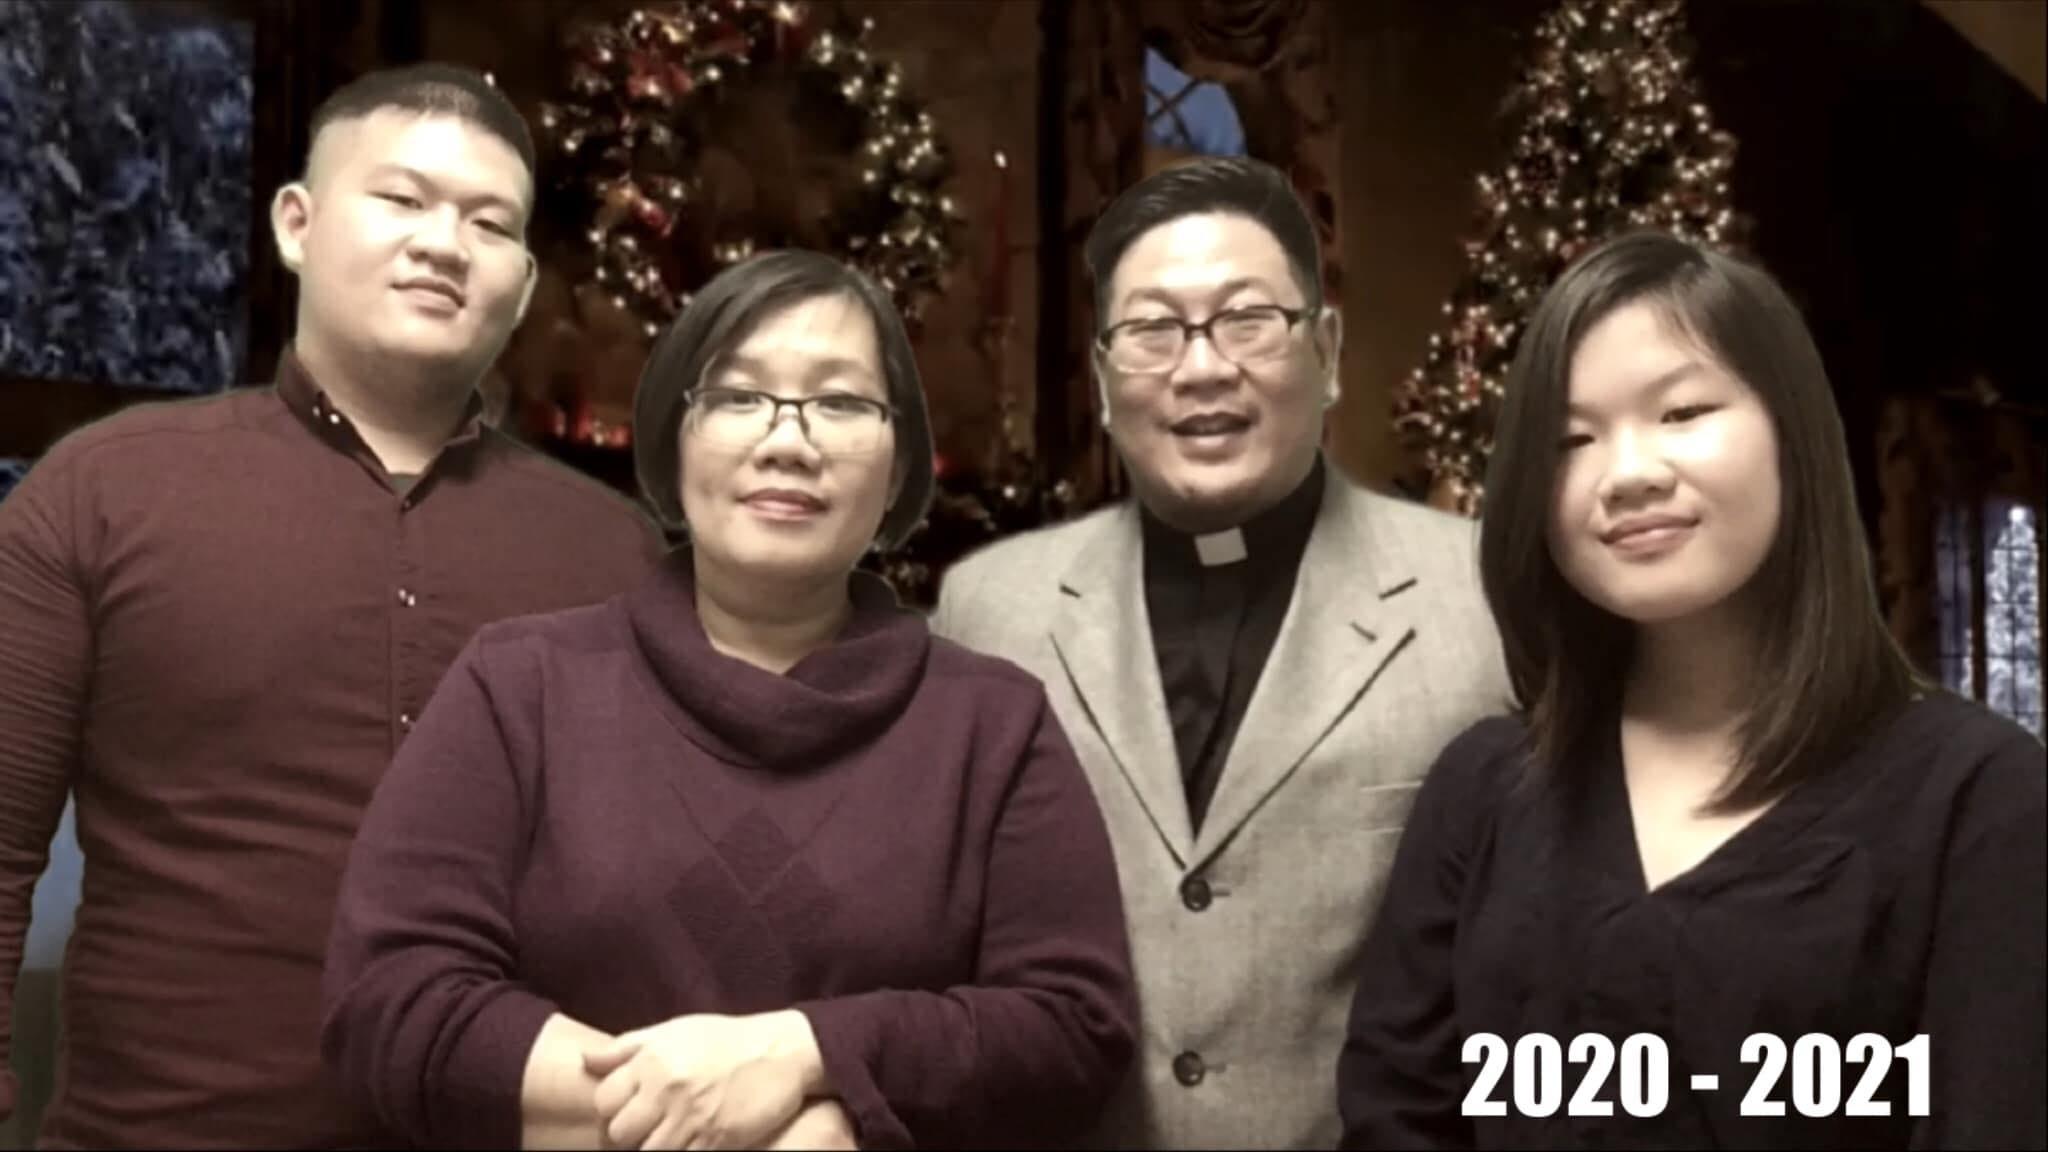 Foto keluarga Joseph Paul Zhang